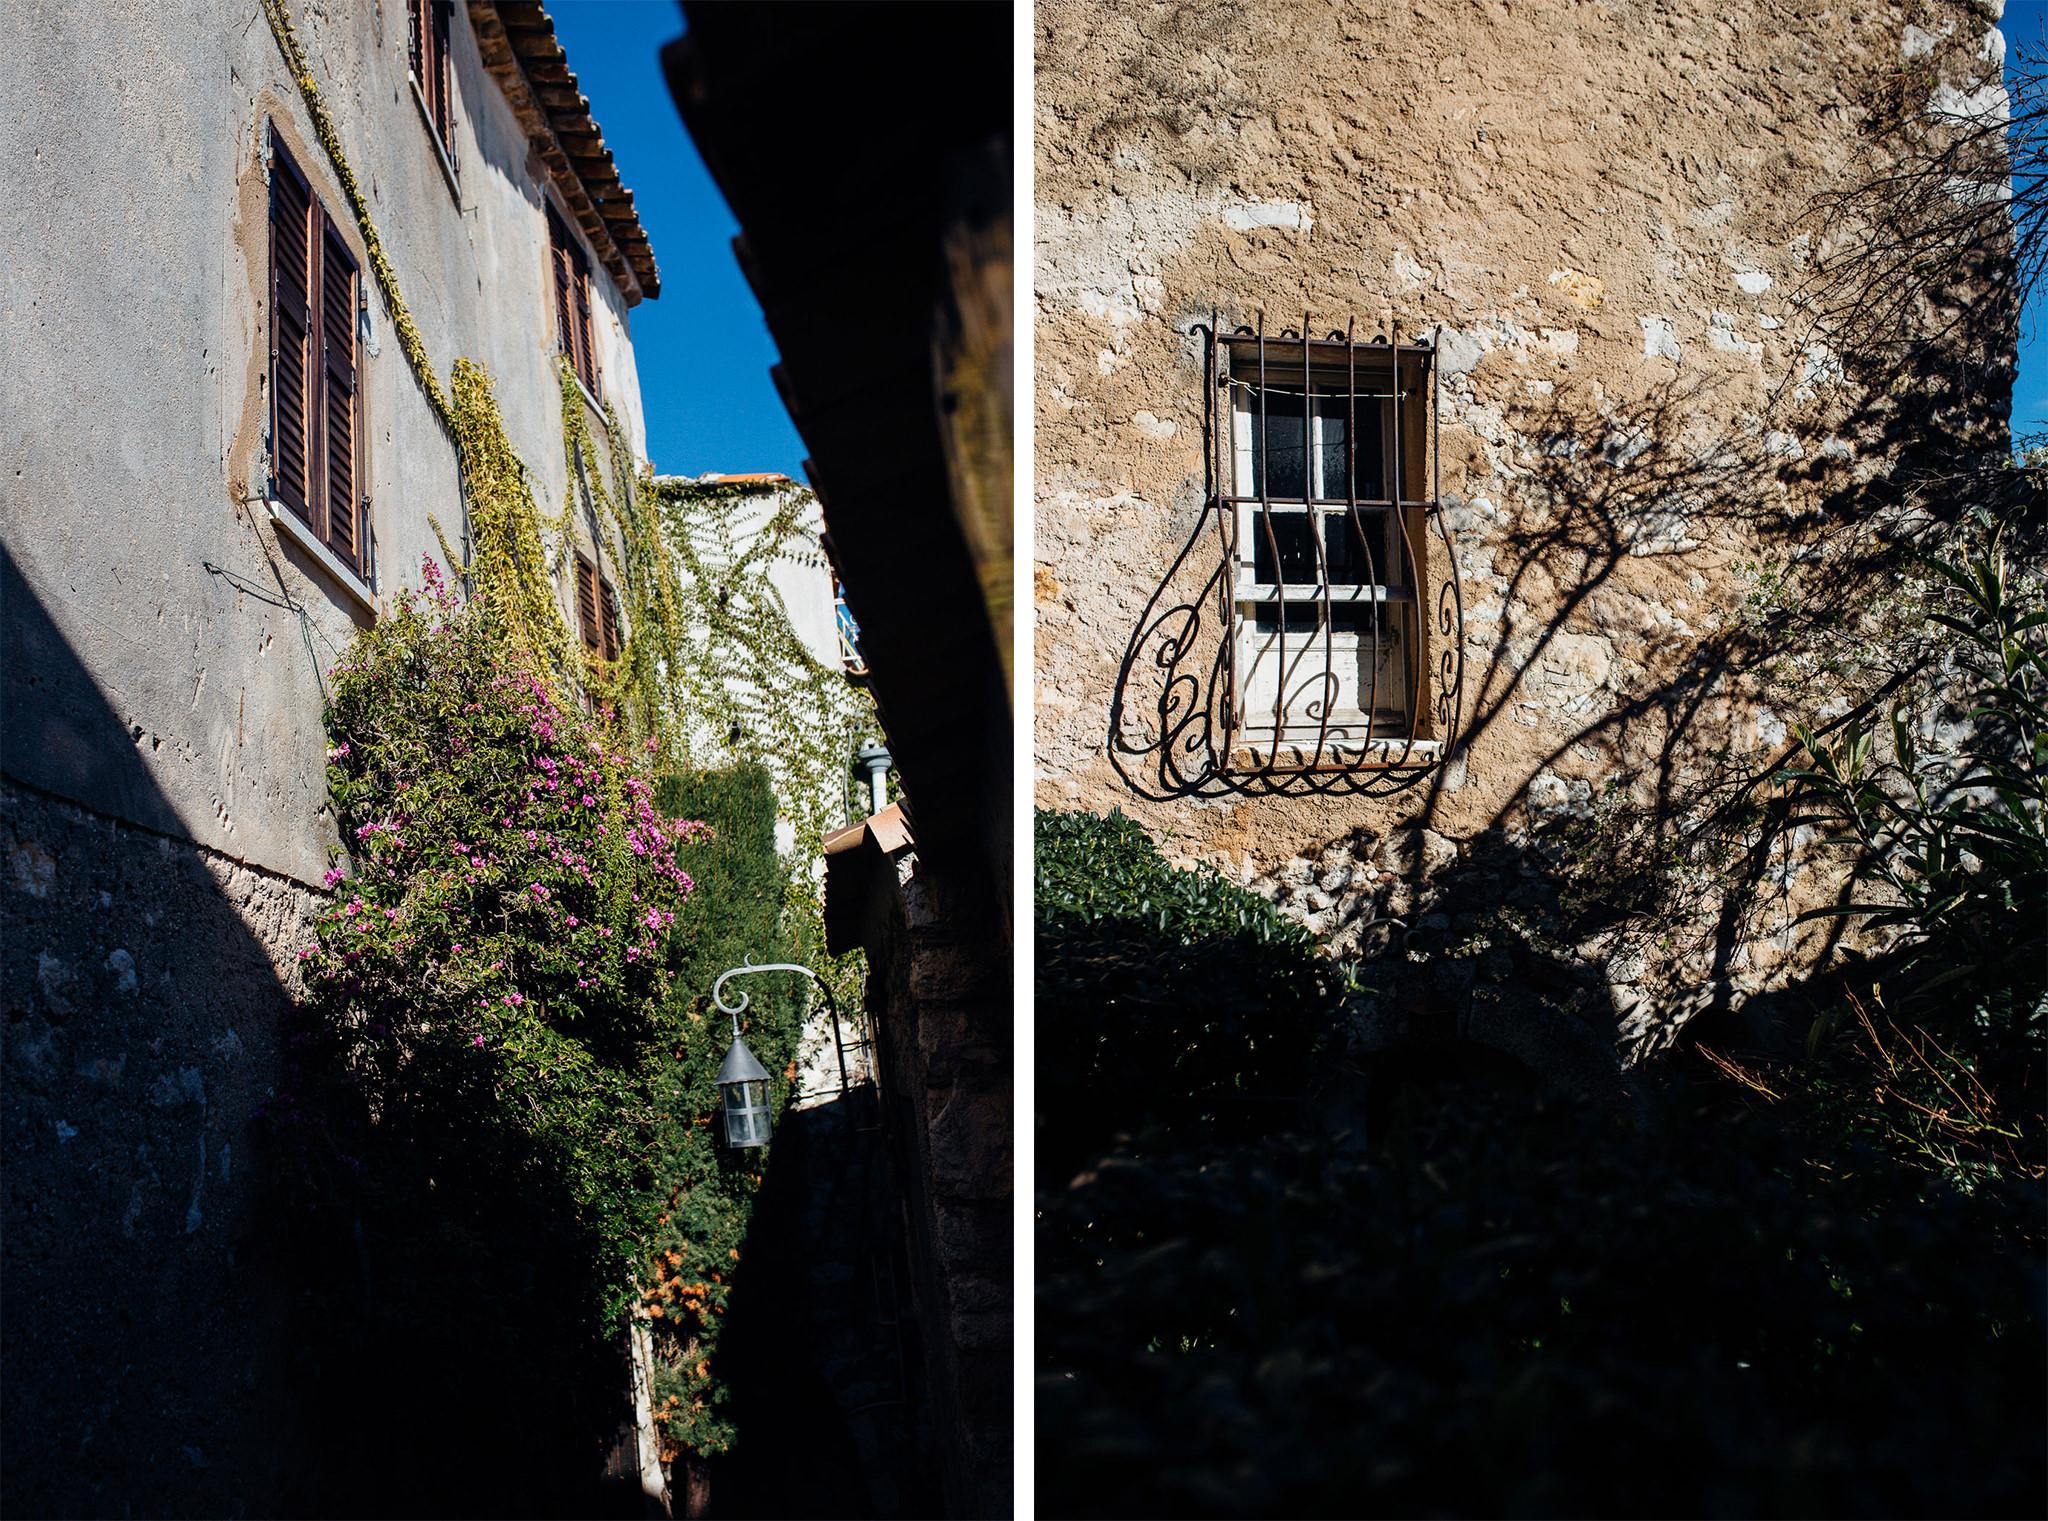 Bogdan-&-Luiza-engagement-Nice-France-1111